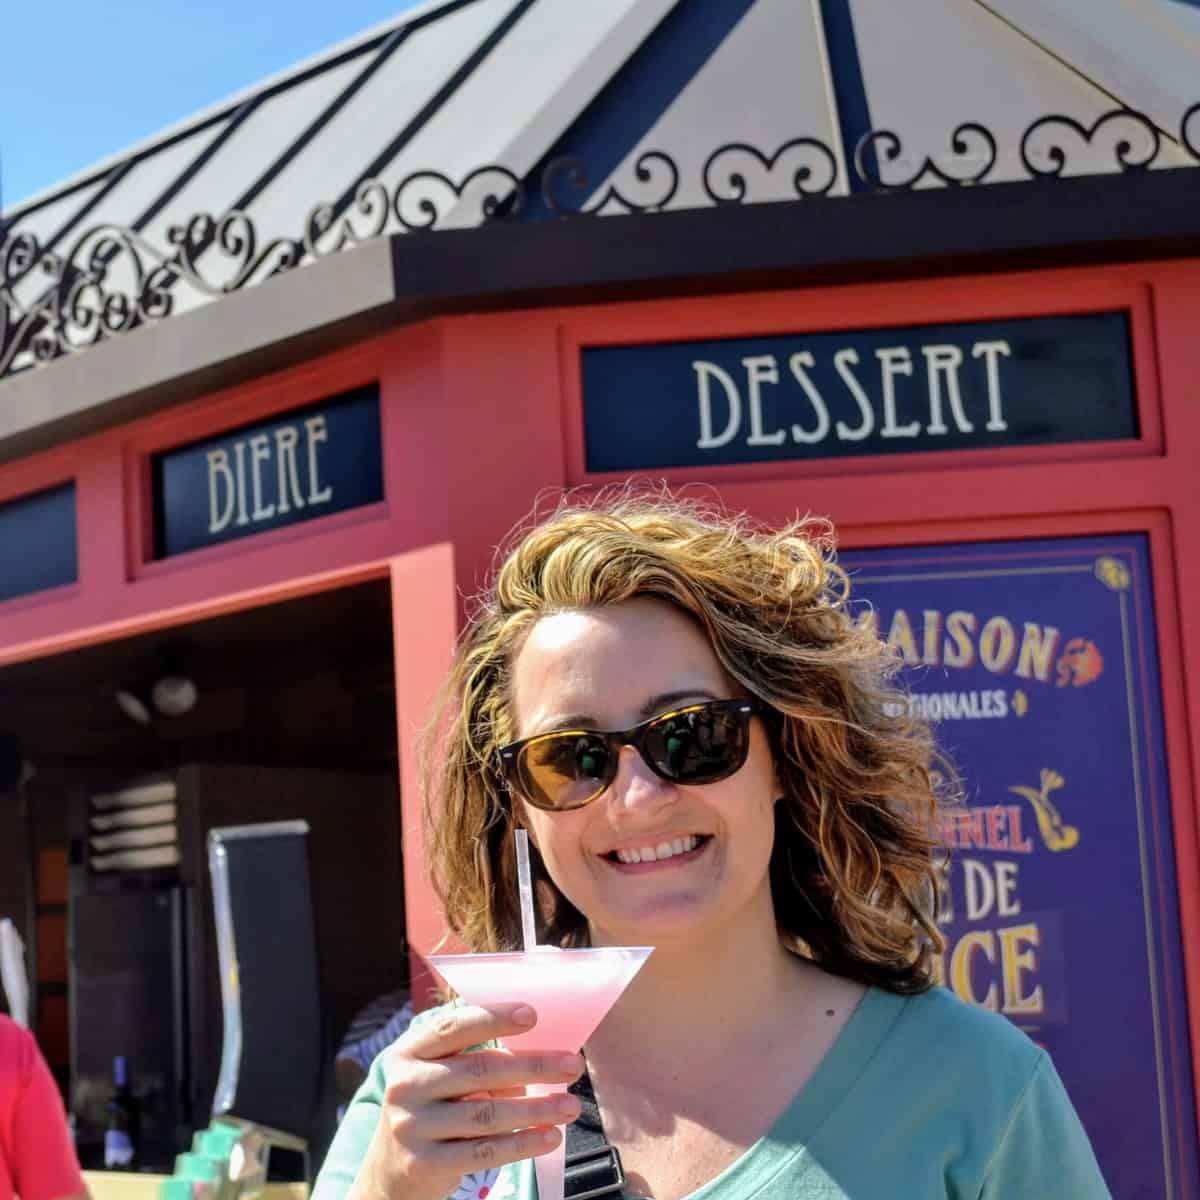 Drinking at Disney World